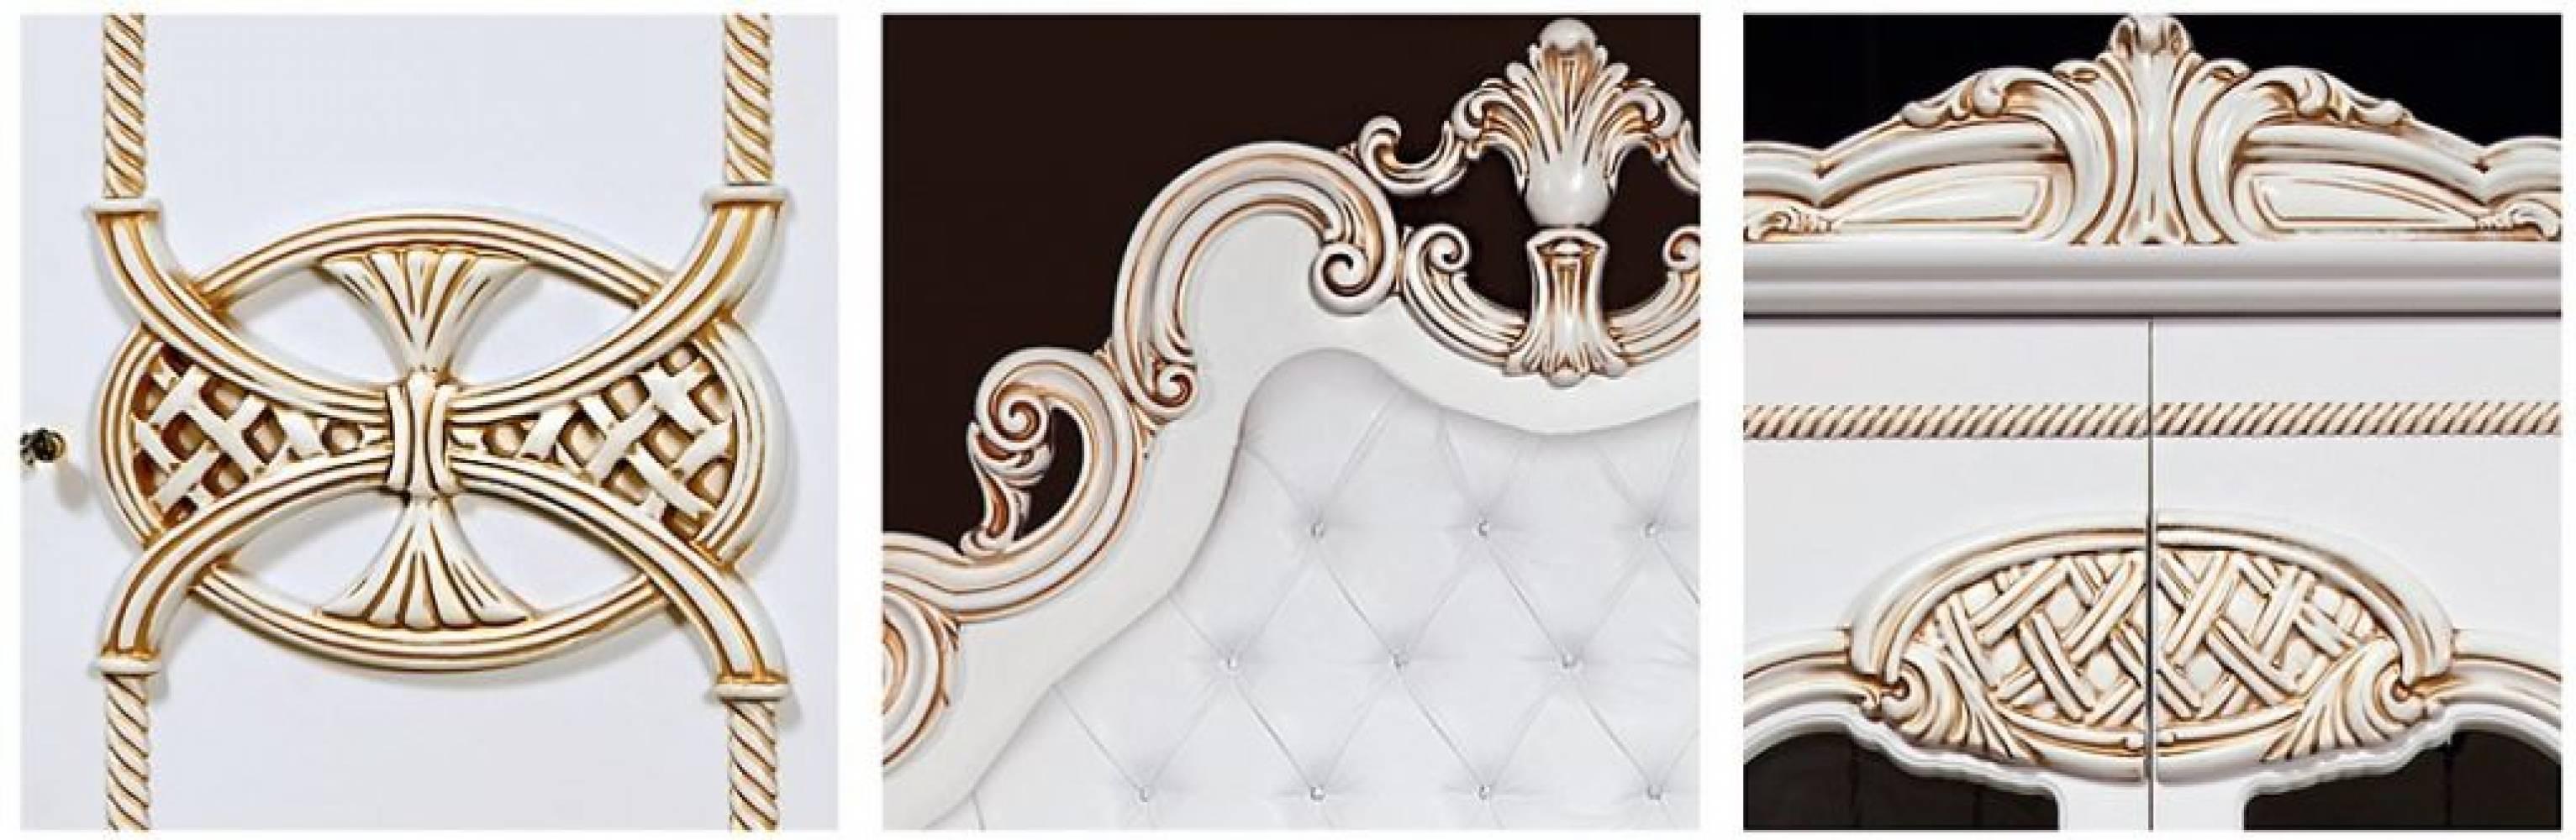 Спальня Розалия КМК 0456-02 (Белая). Комплект 1